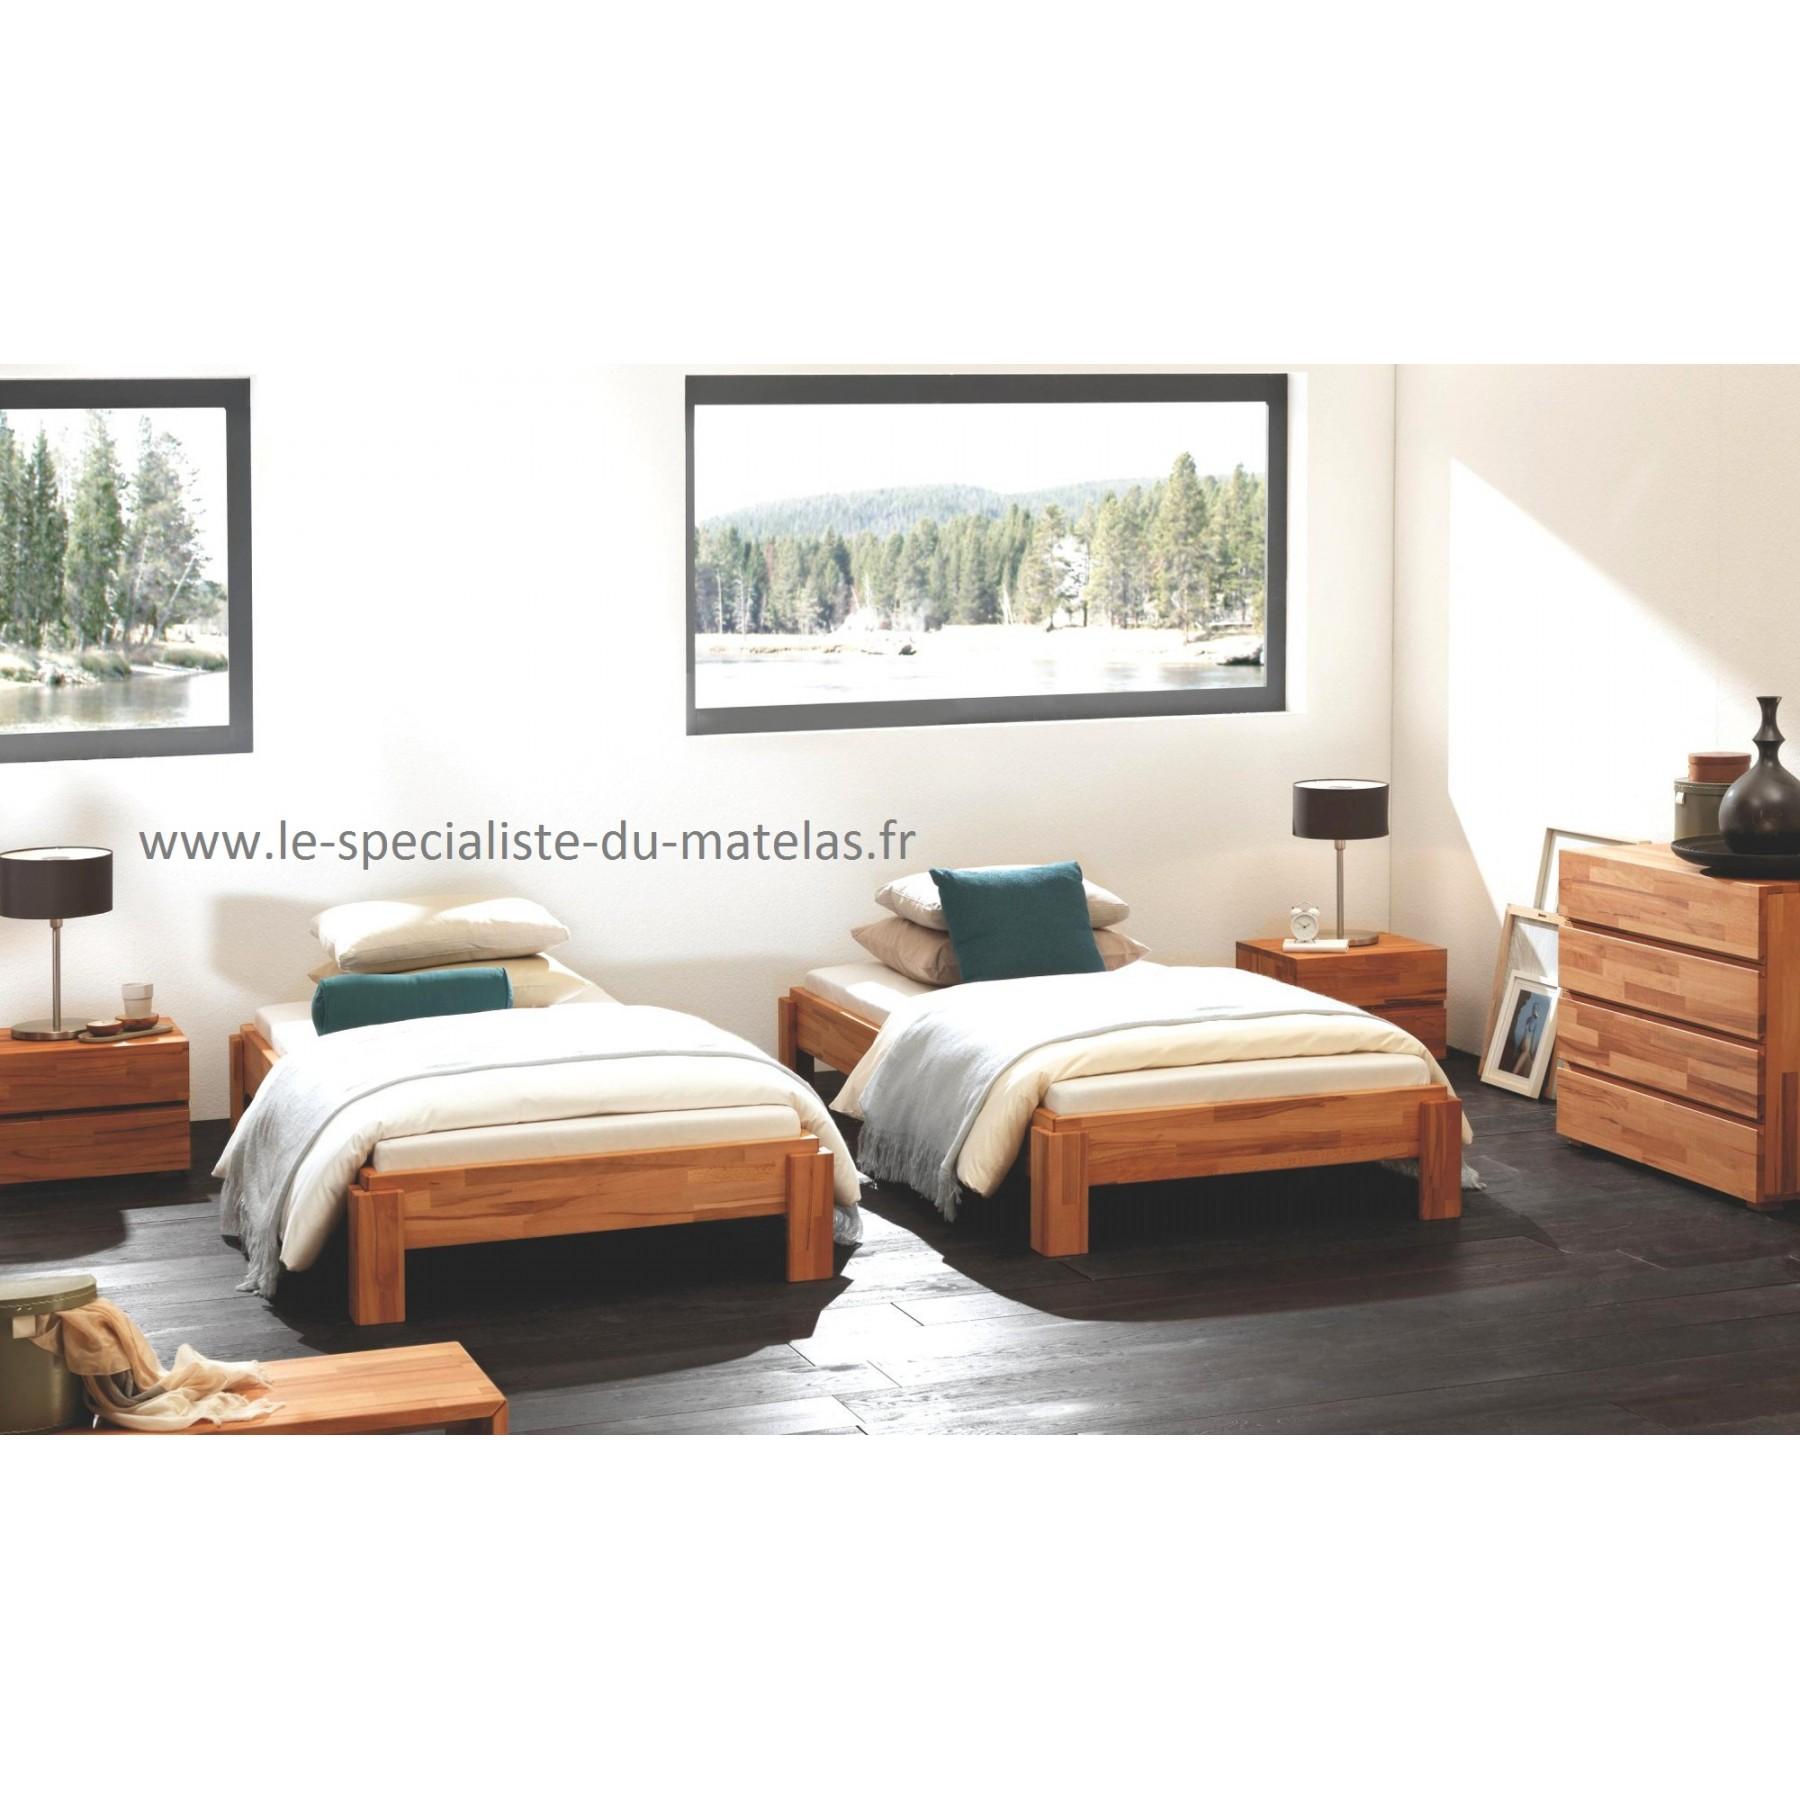 lit gigogne hasena mod le amigo d couvrir au le. Black Bedroom Furniture Sets. Home Design Ideas